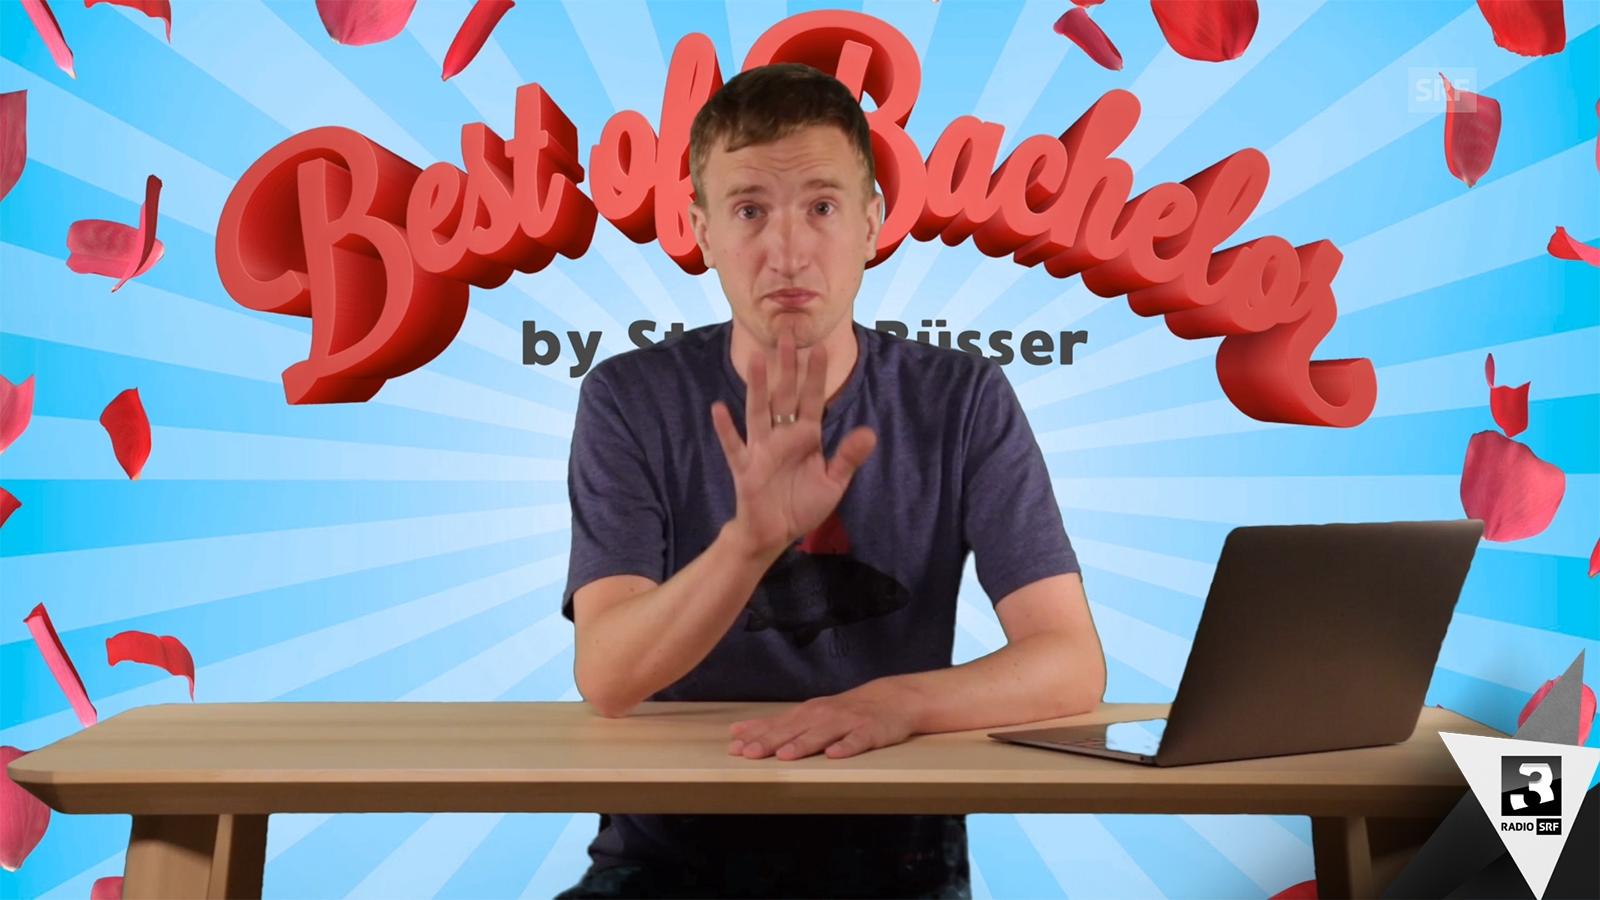 Stefan Büssers Best of Bachelor: Folge 6